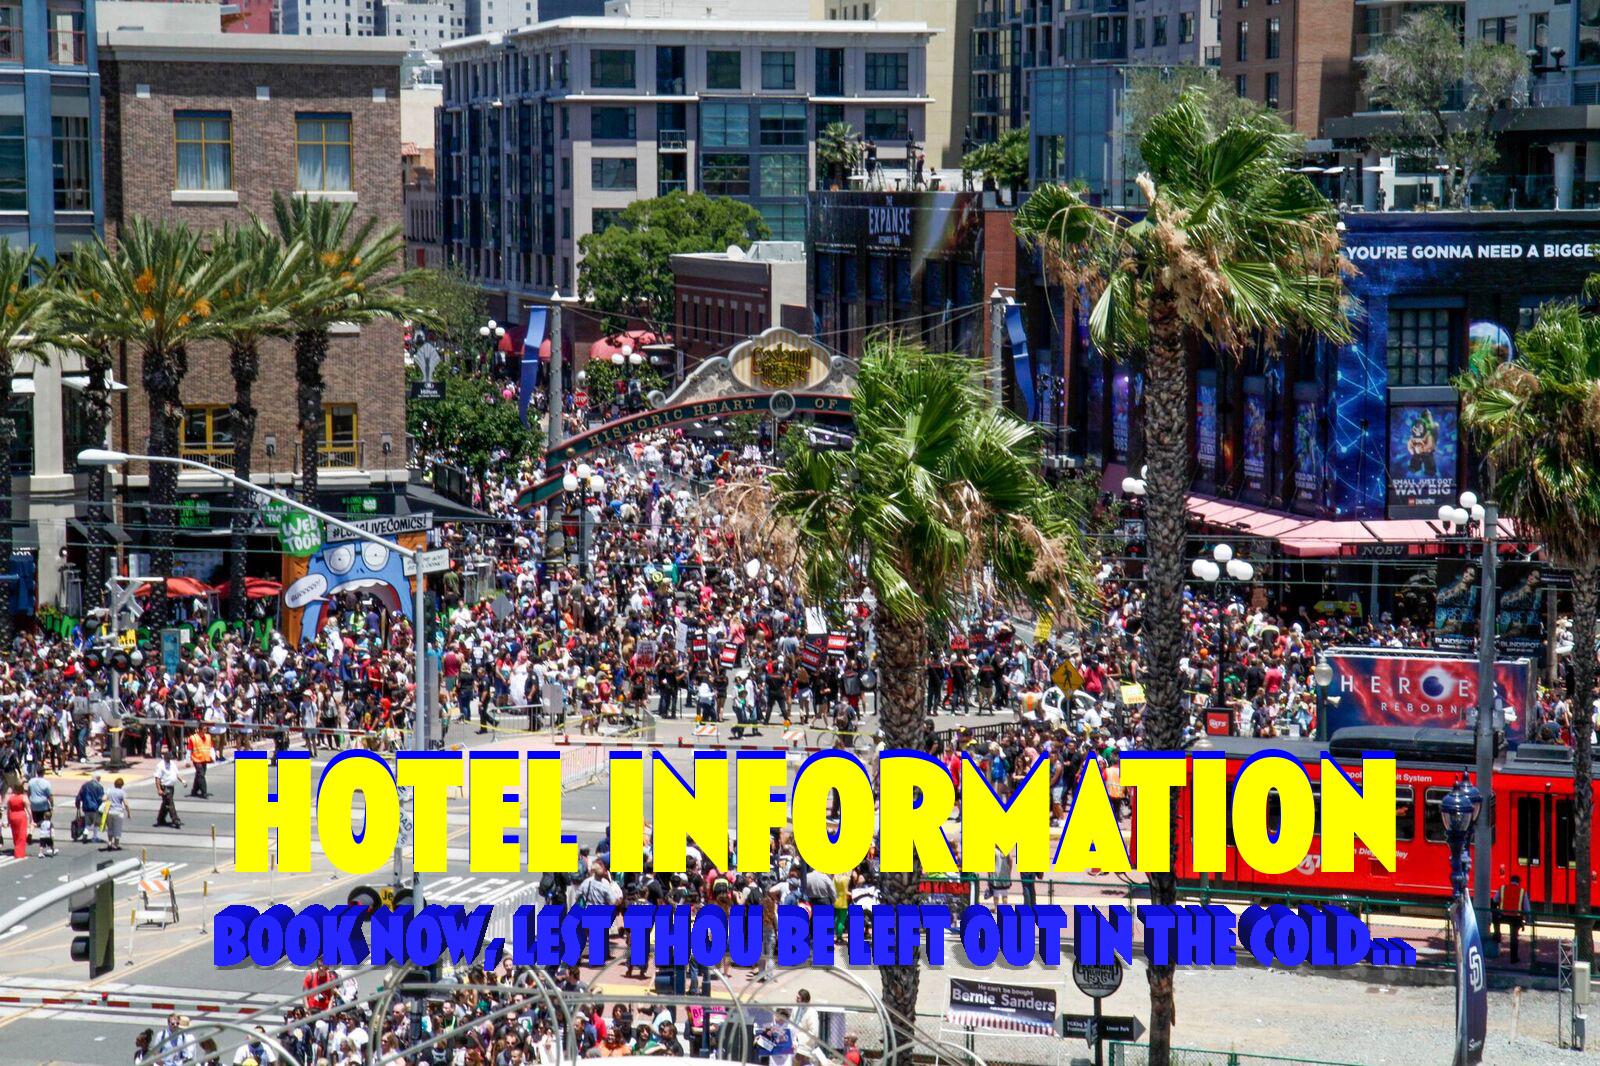 Amercias-finest-comic-expo-hotels_COPY.jpg